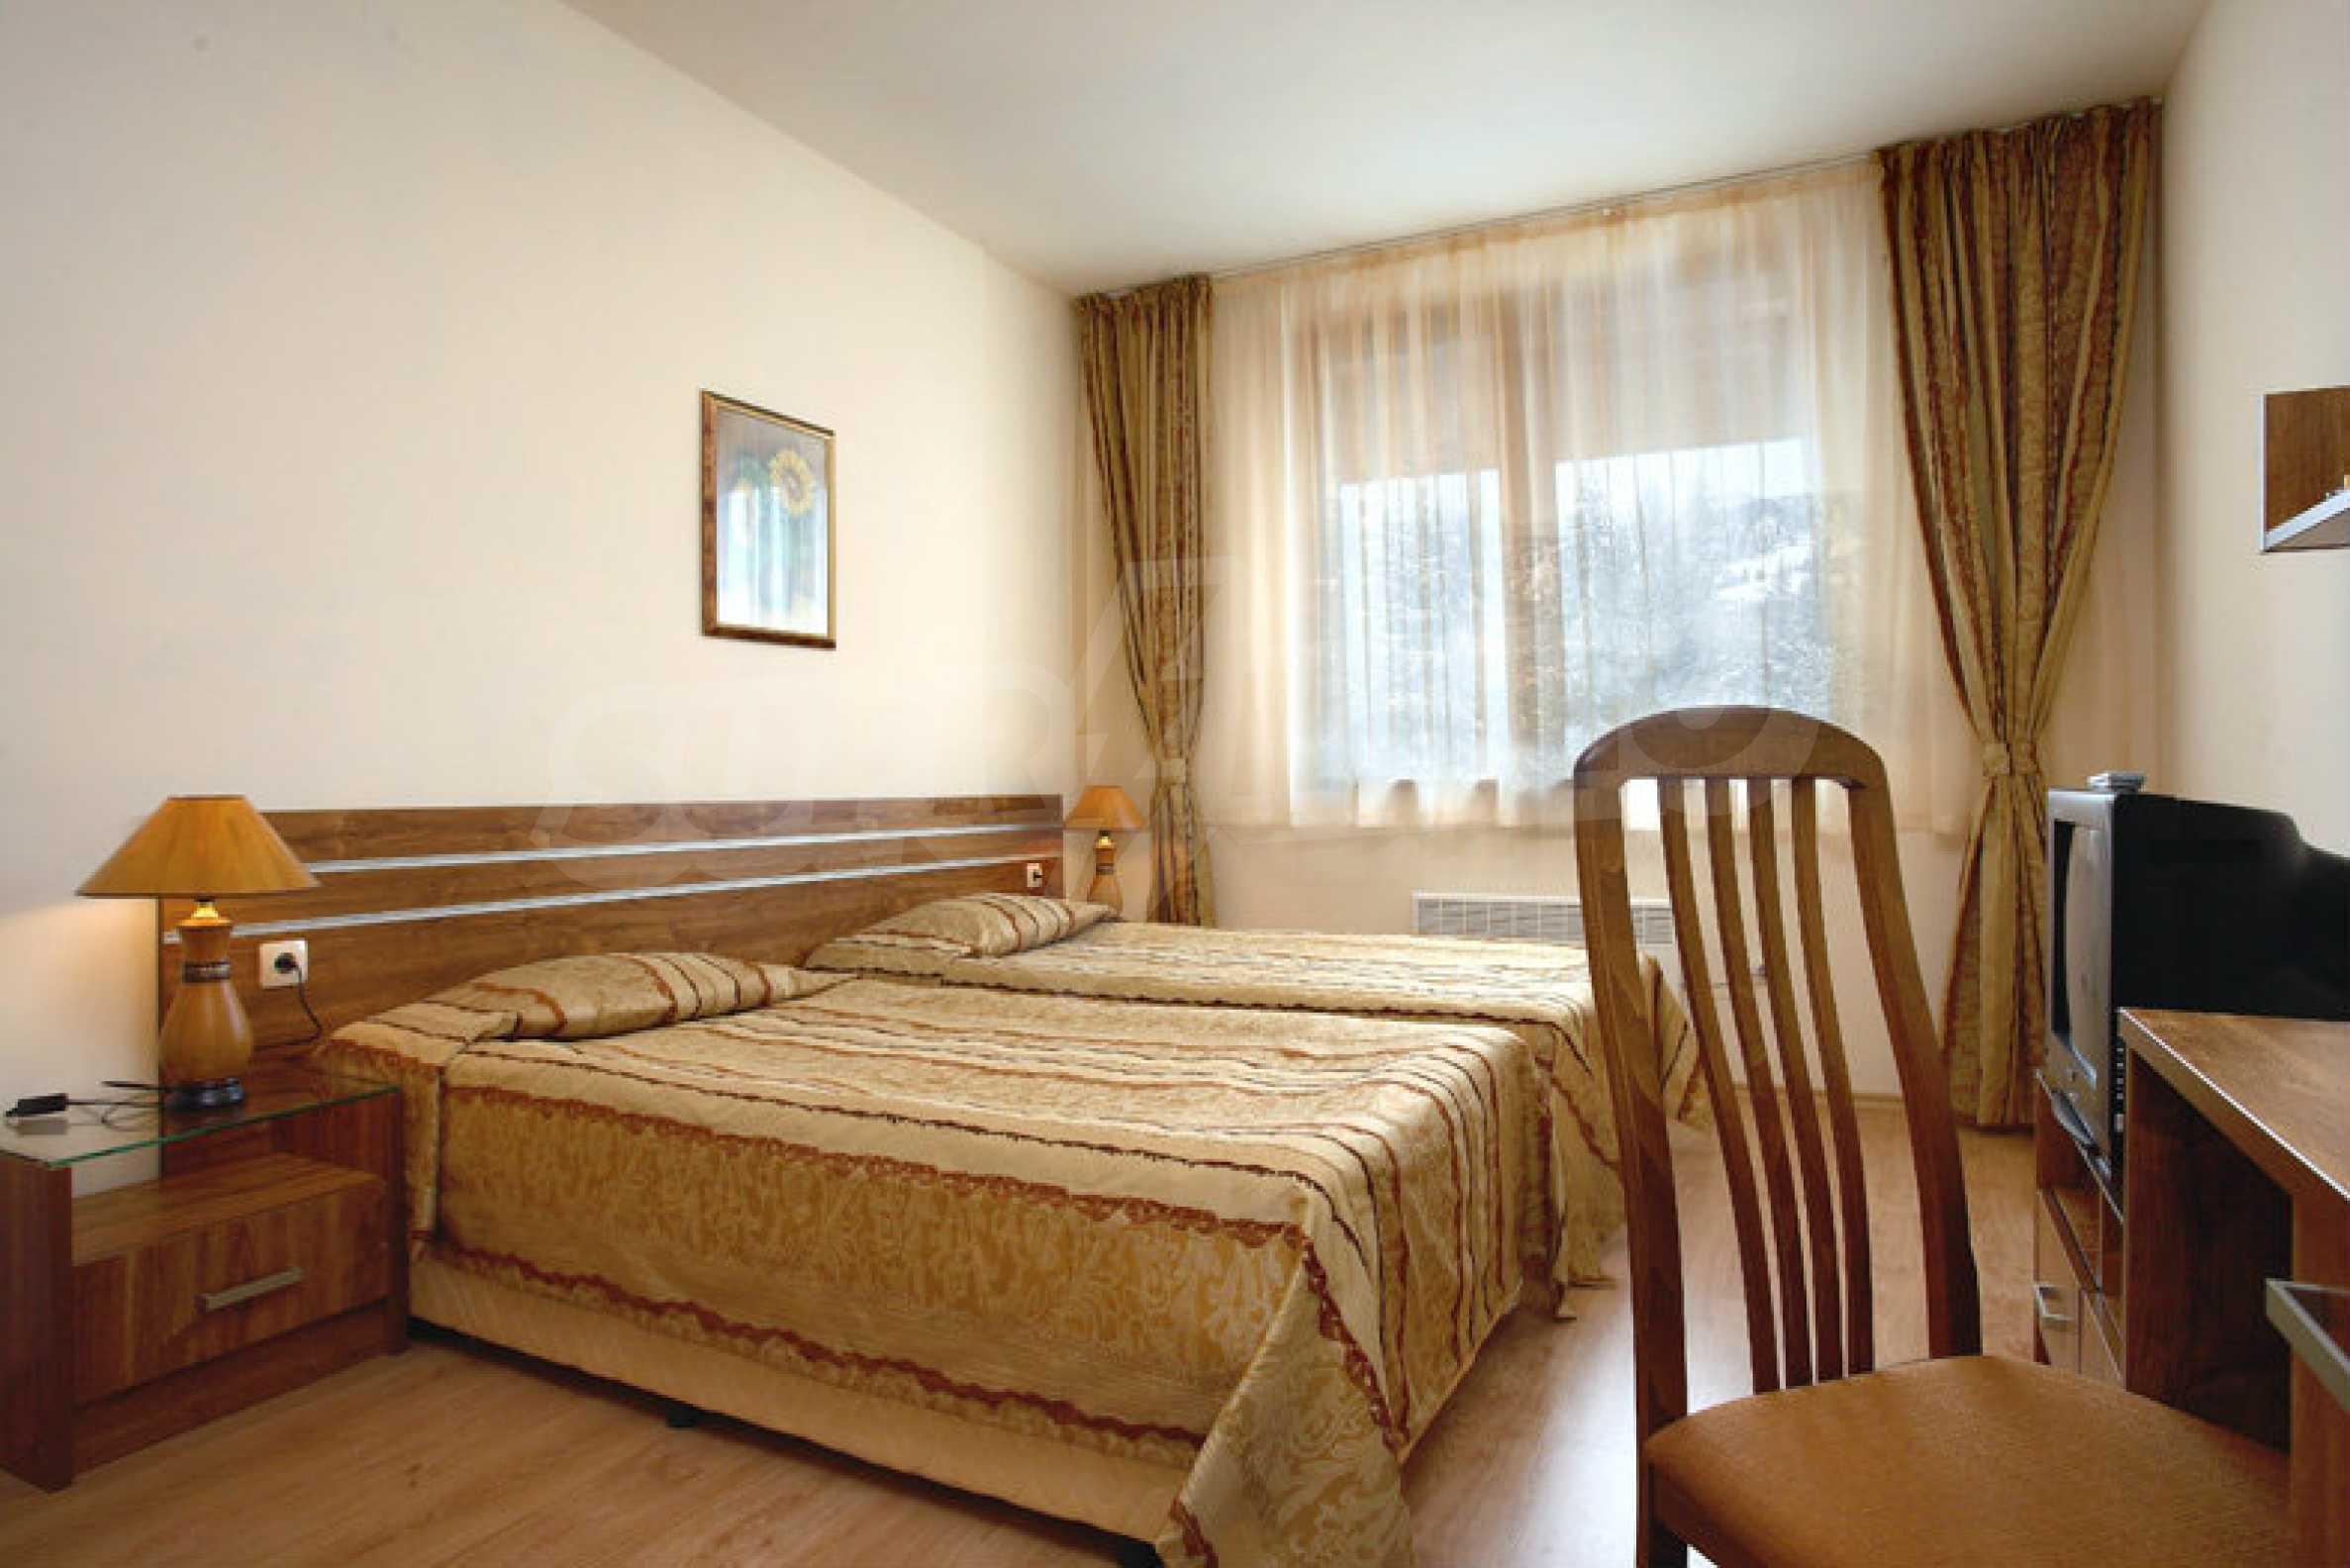 Luxuriös eingerichtetes Studio im Perelik Palace SPA Hotel 1